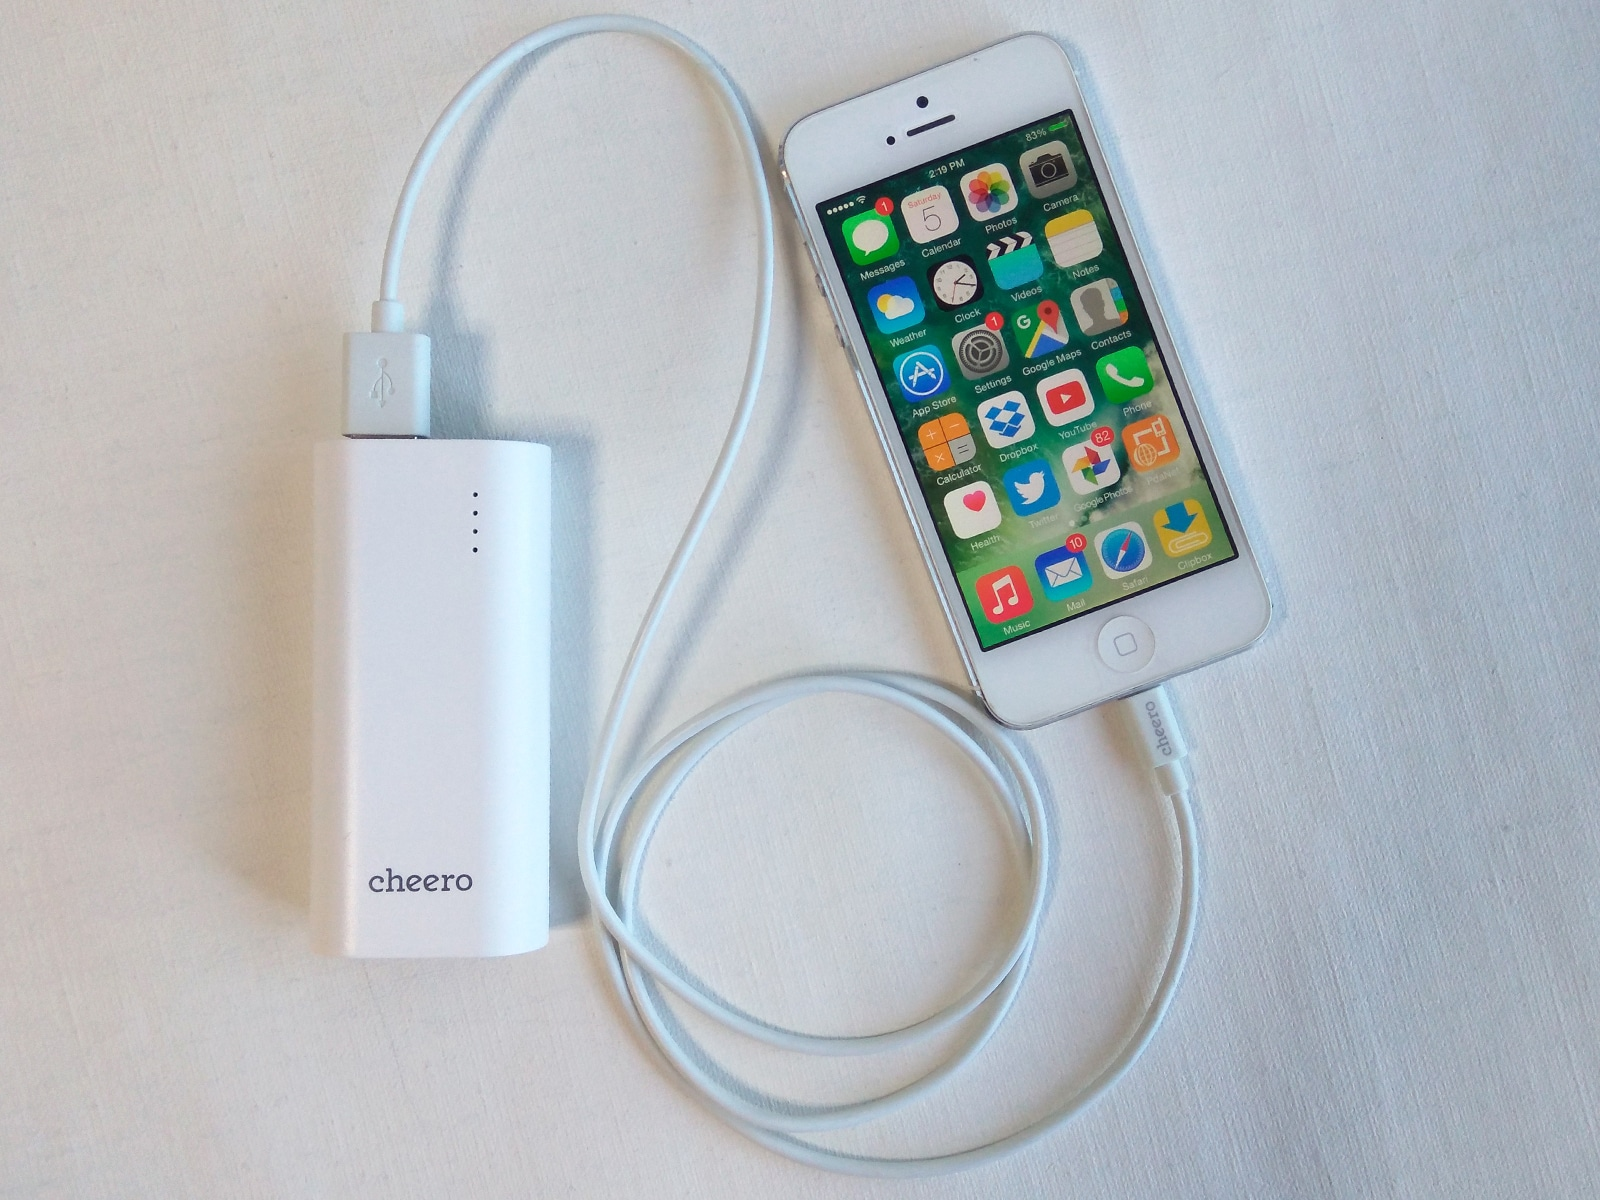 cheero Power Plus 3 mini 5200mAh iPhoneを充電